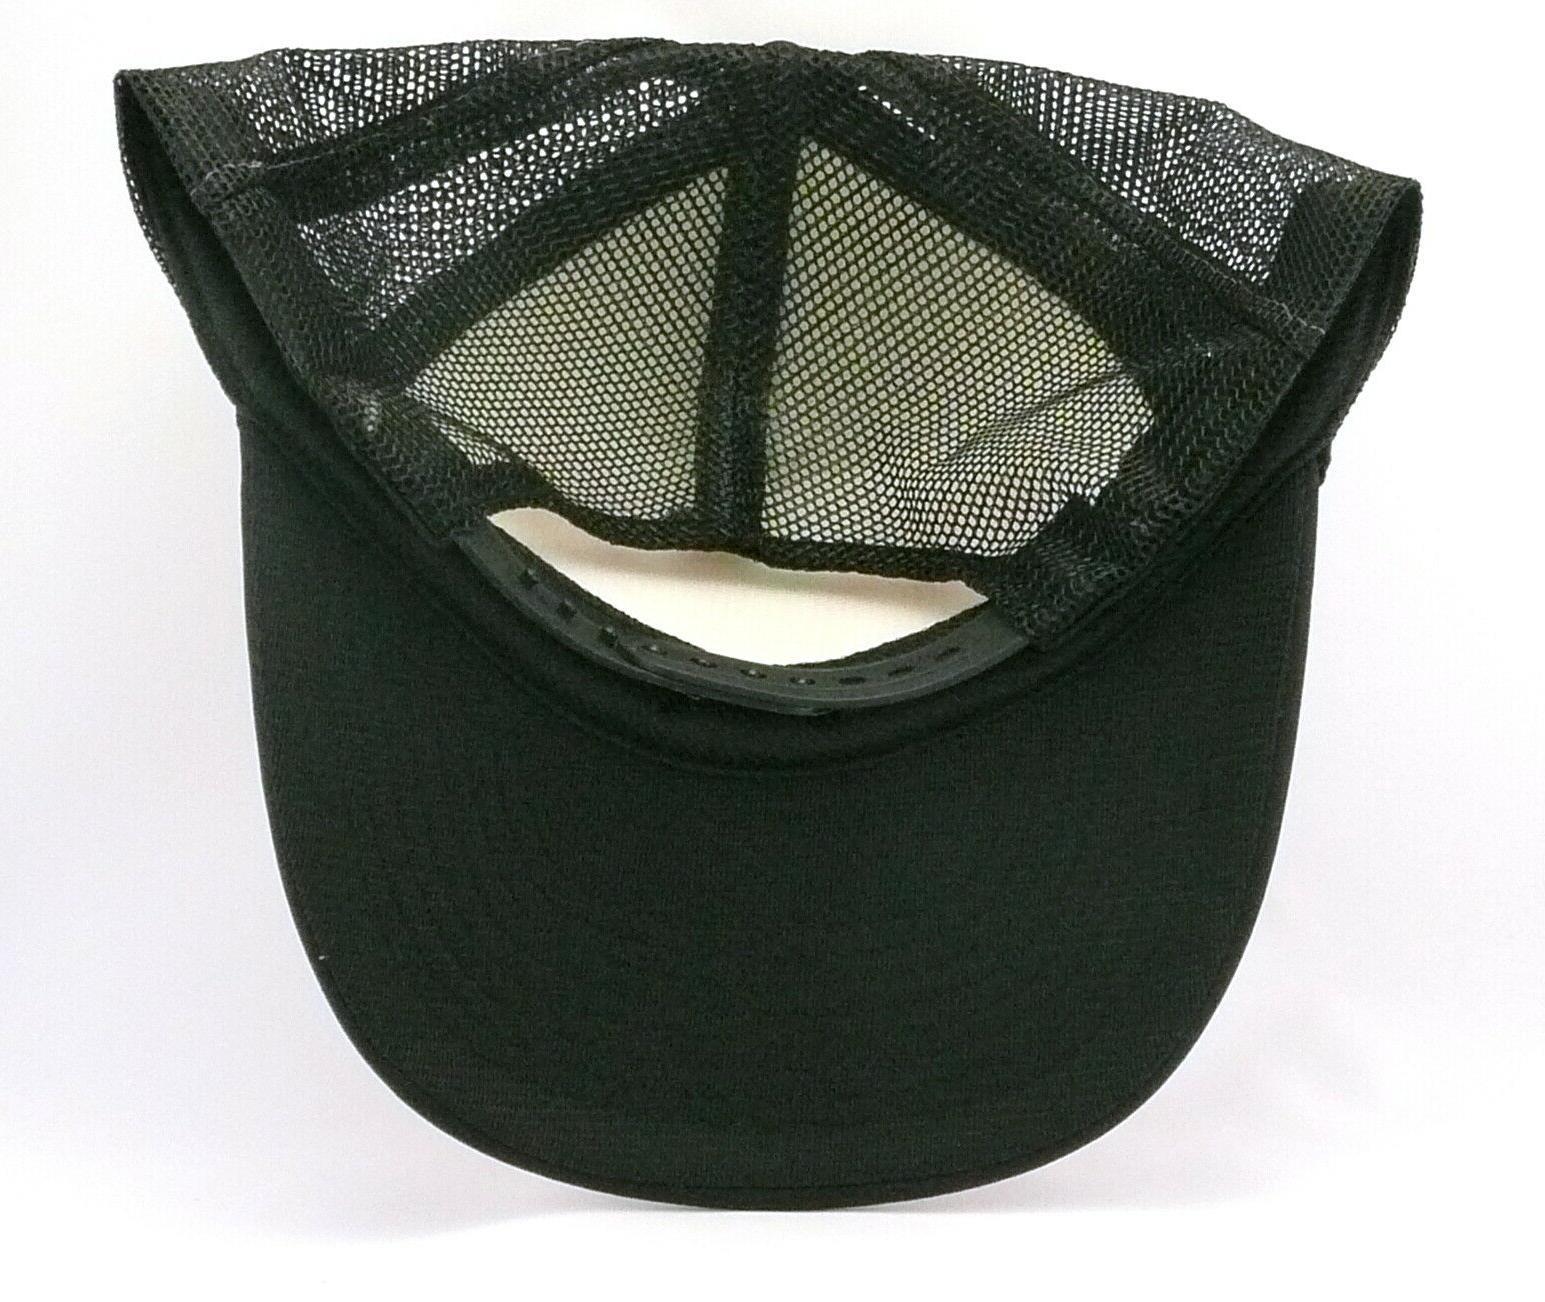 Suzuki hat trucker hat snap back new black new